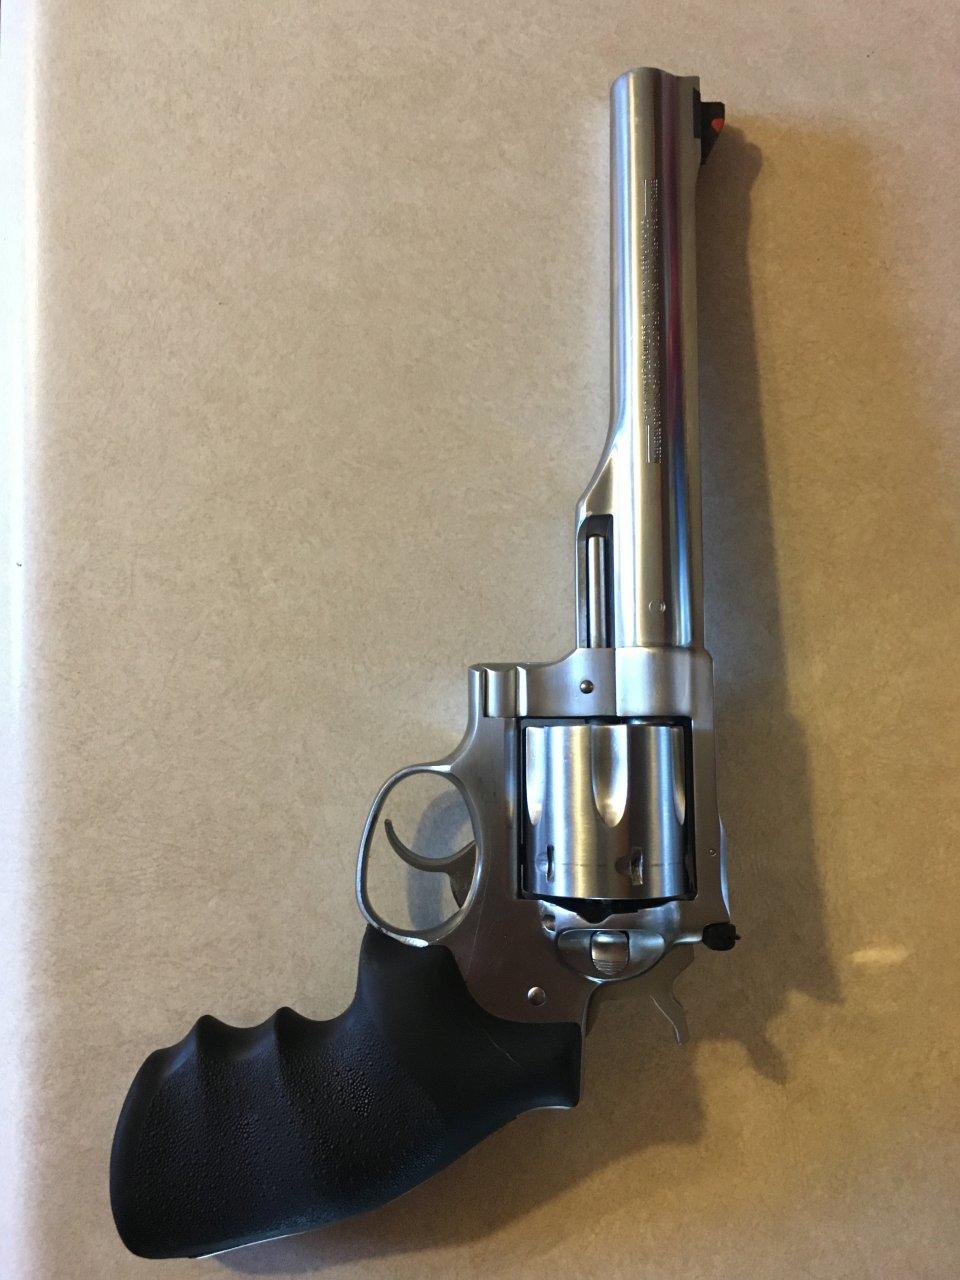 Seeking Value Of Ruger Redhawk  44 Mag | Gun Values Board